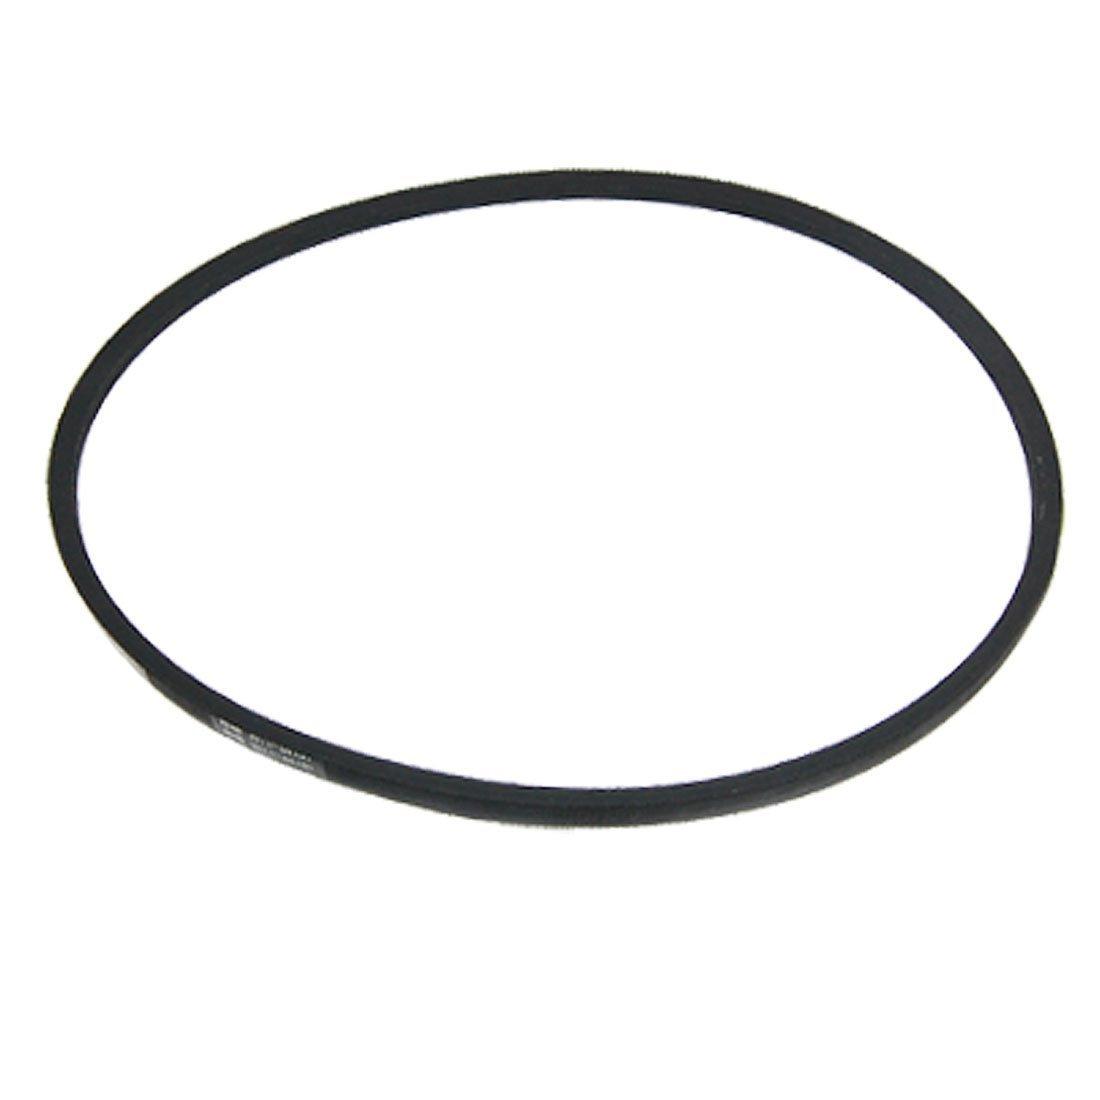 Transmitting Pulley Blk Rubber A1100 Drive Band V Belt